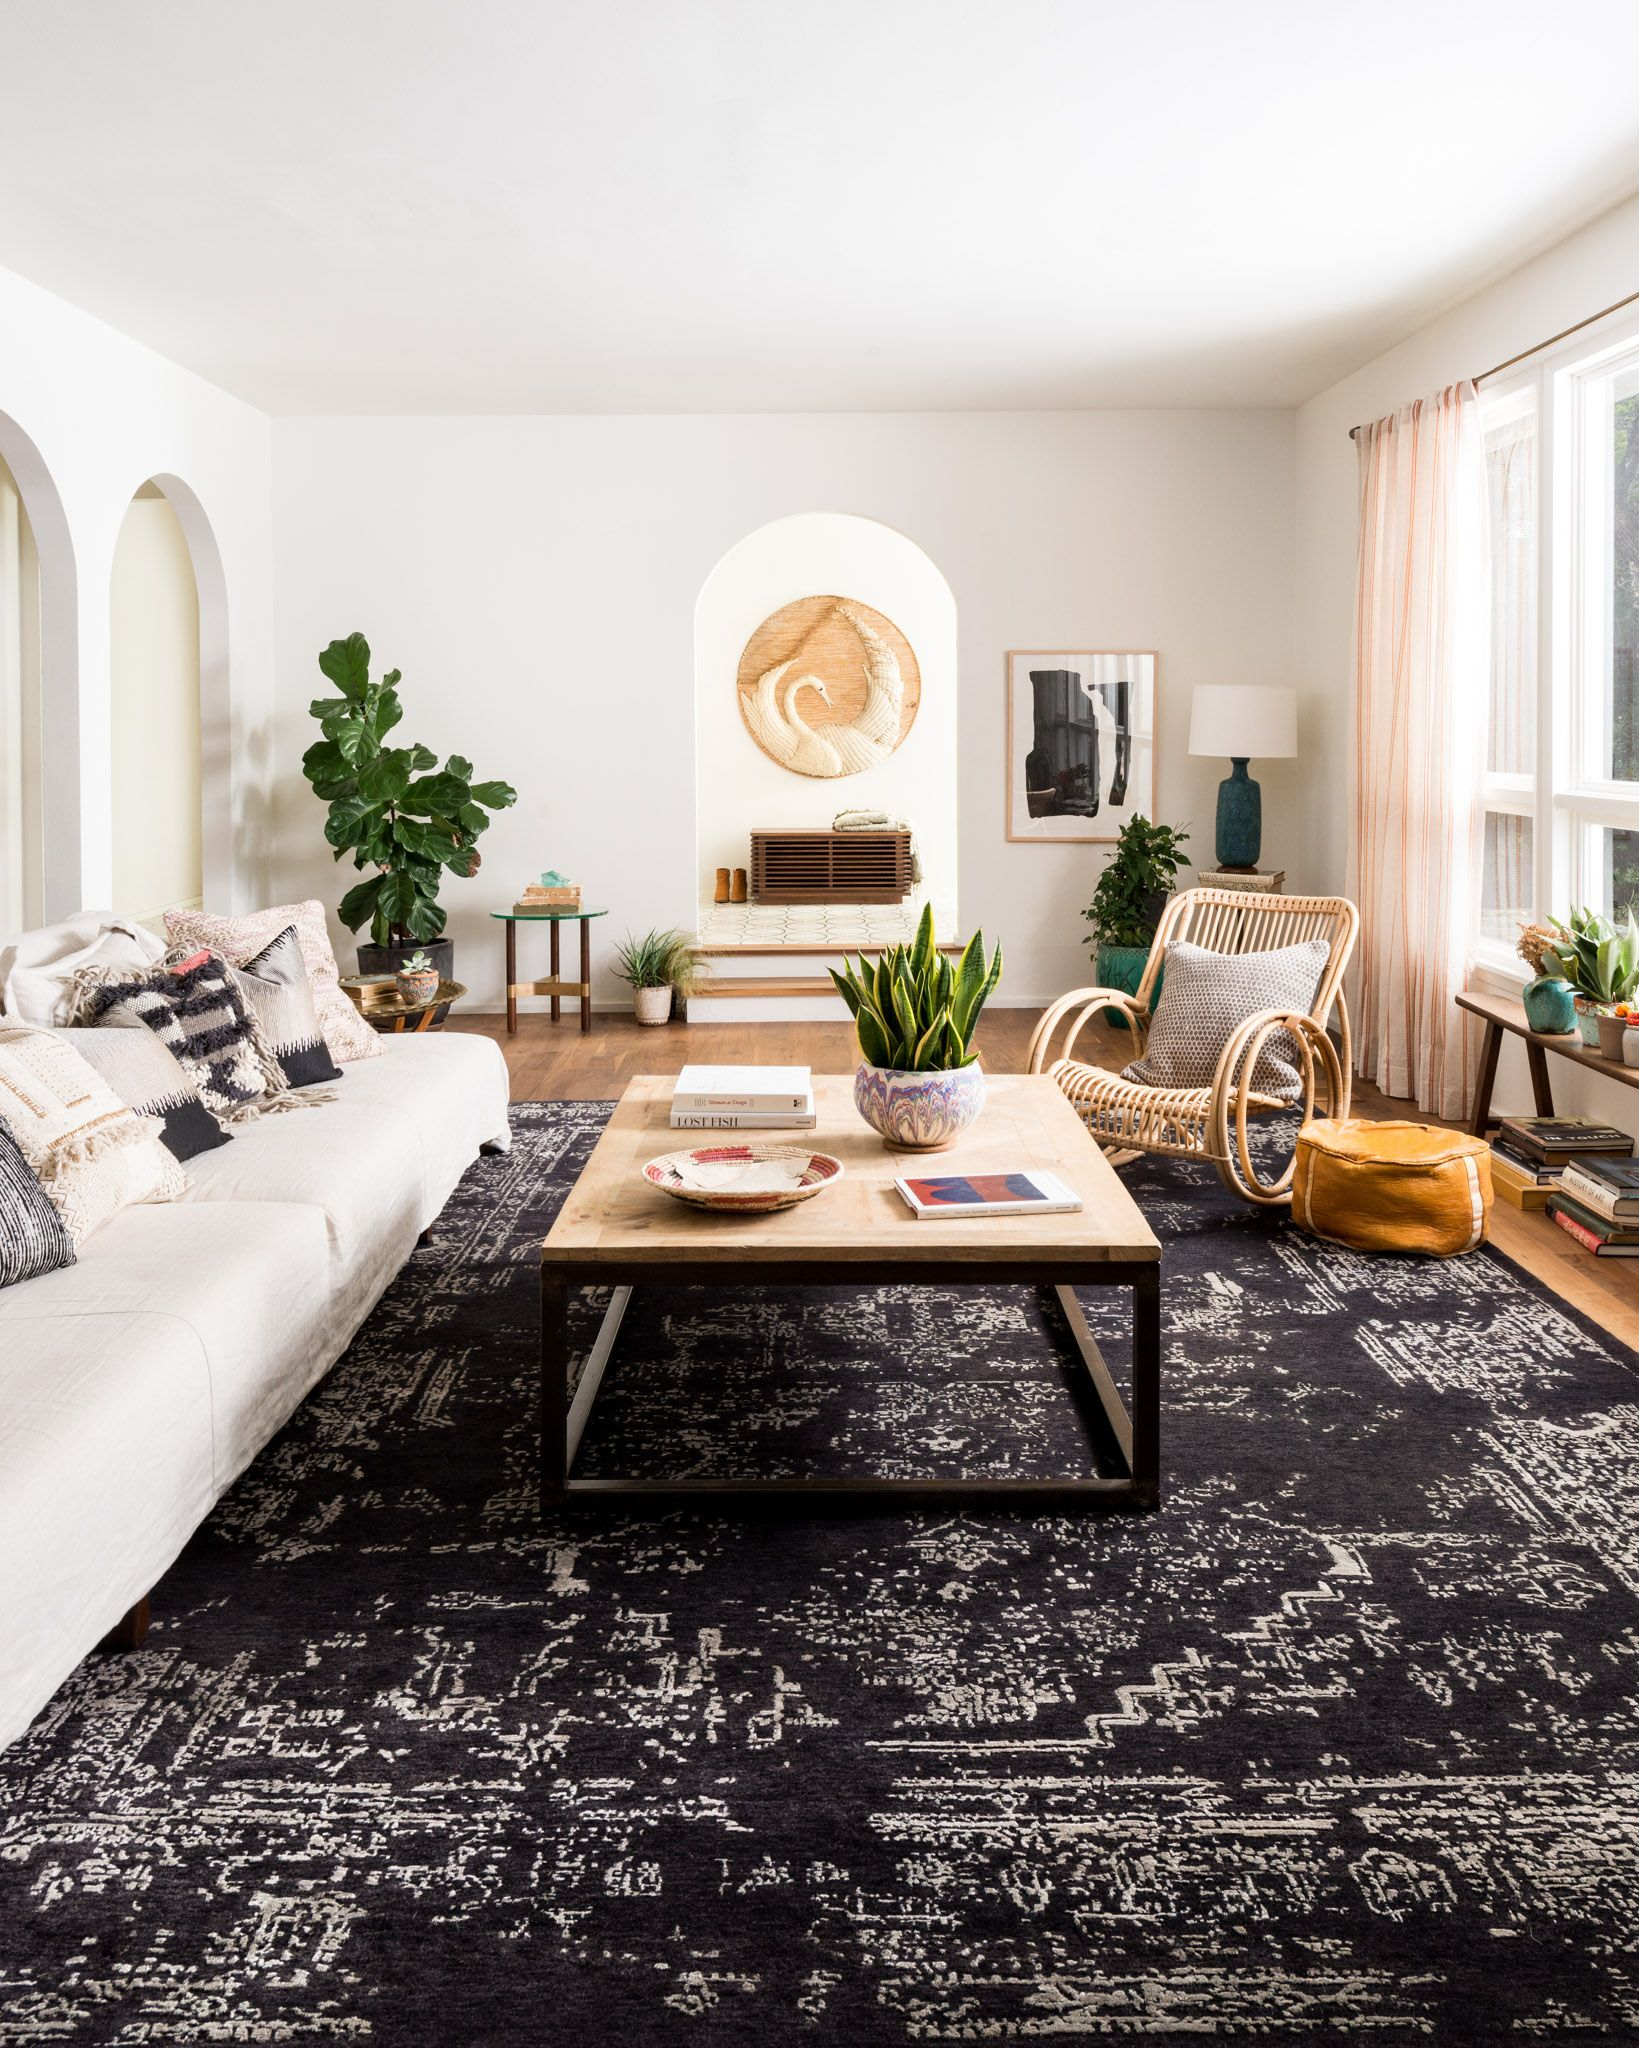 Loloi Elsa Ef 03 Charcoal Rug Rugs In Living Room Living Room Carpet Black Carpet Living Room